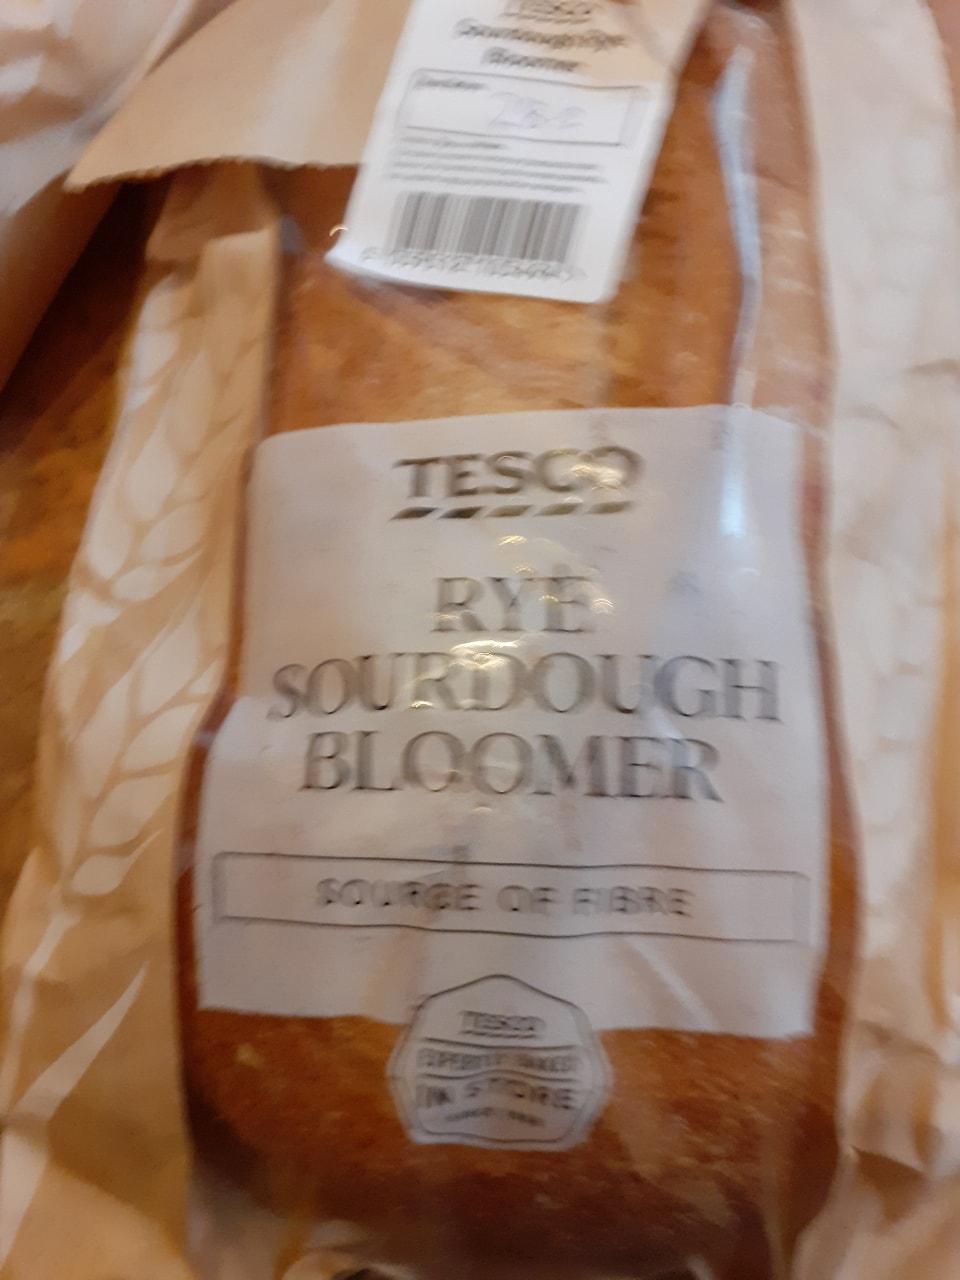 Rye sourdough bloomer